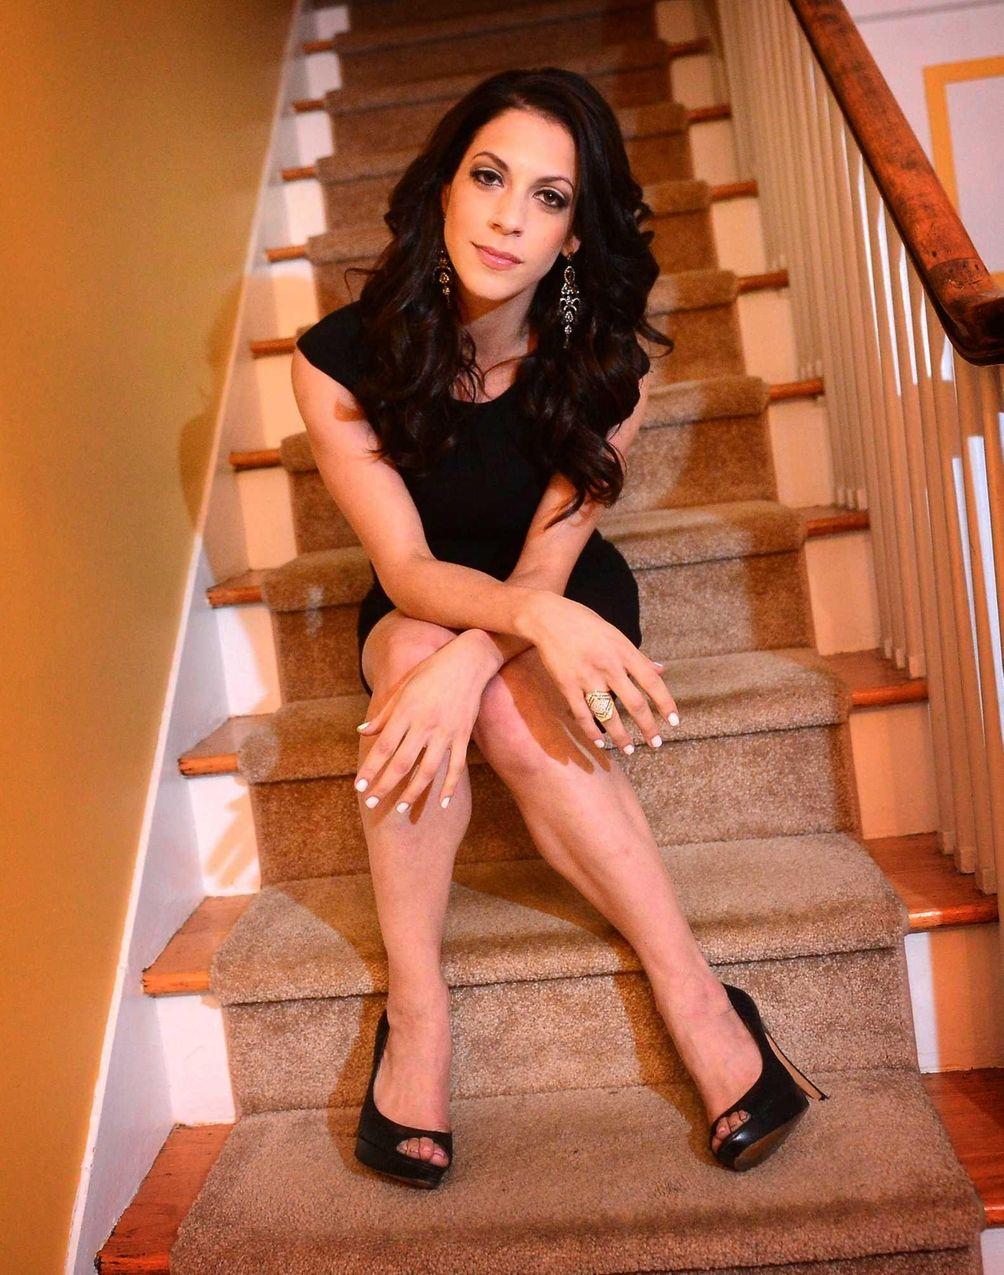 Joey Lauren of the Bravo reality show